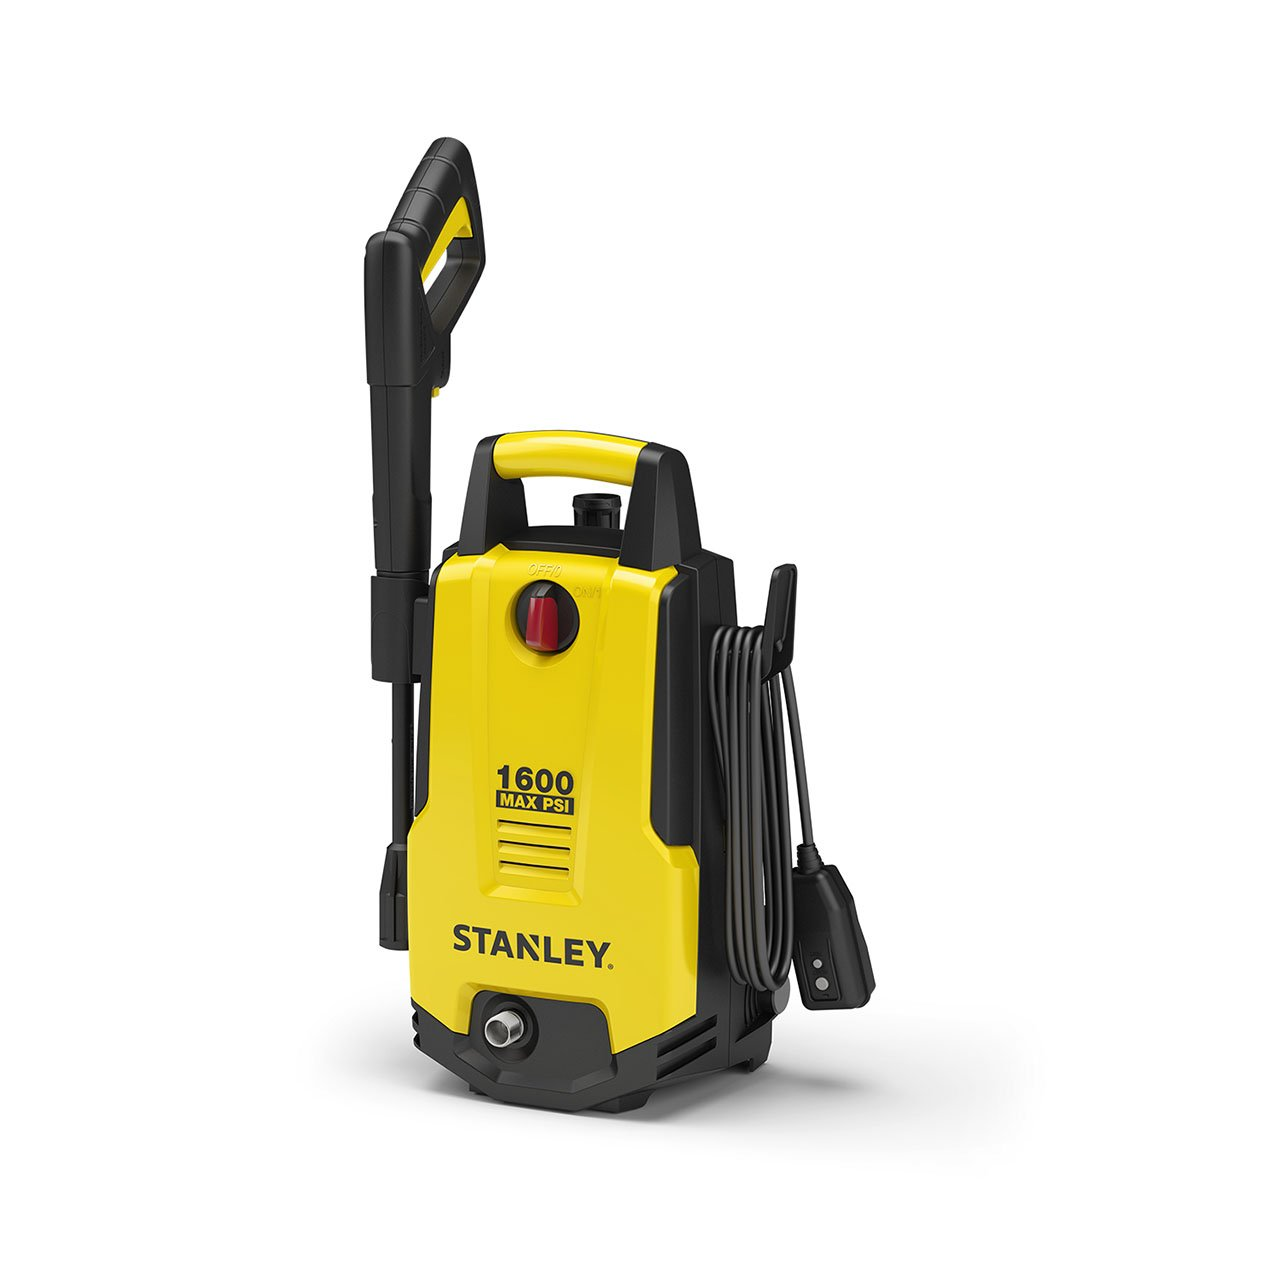 Stanley SHP1600 1600 Psi Electric Pressure Washer with Vari-Spray Nozzle, Wand, Spray Gun, 20' Hose & Detergent Bottle, Yellow